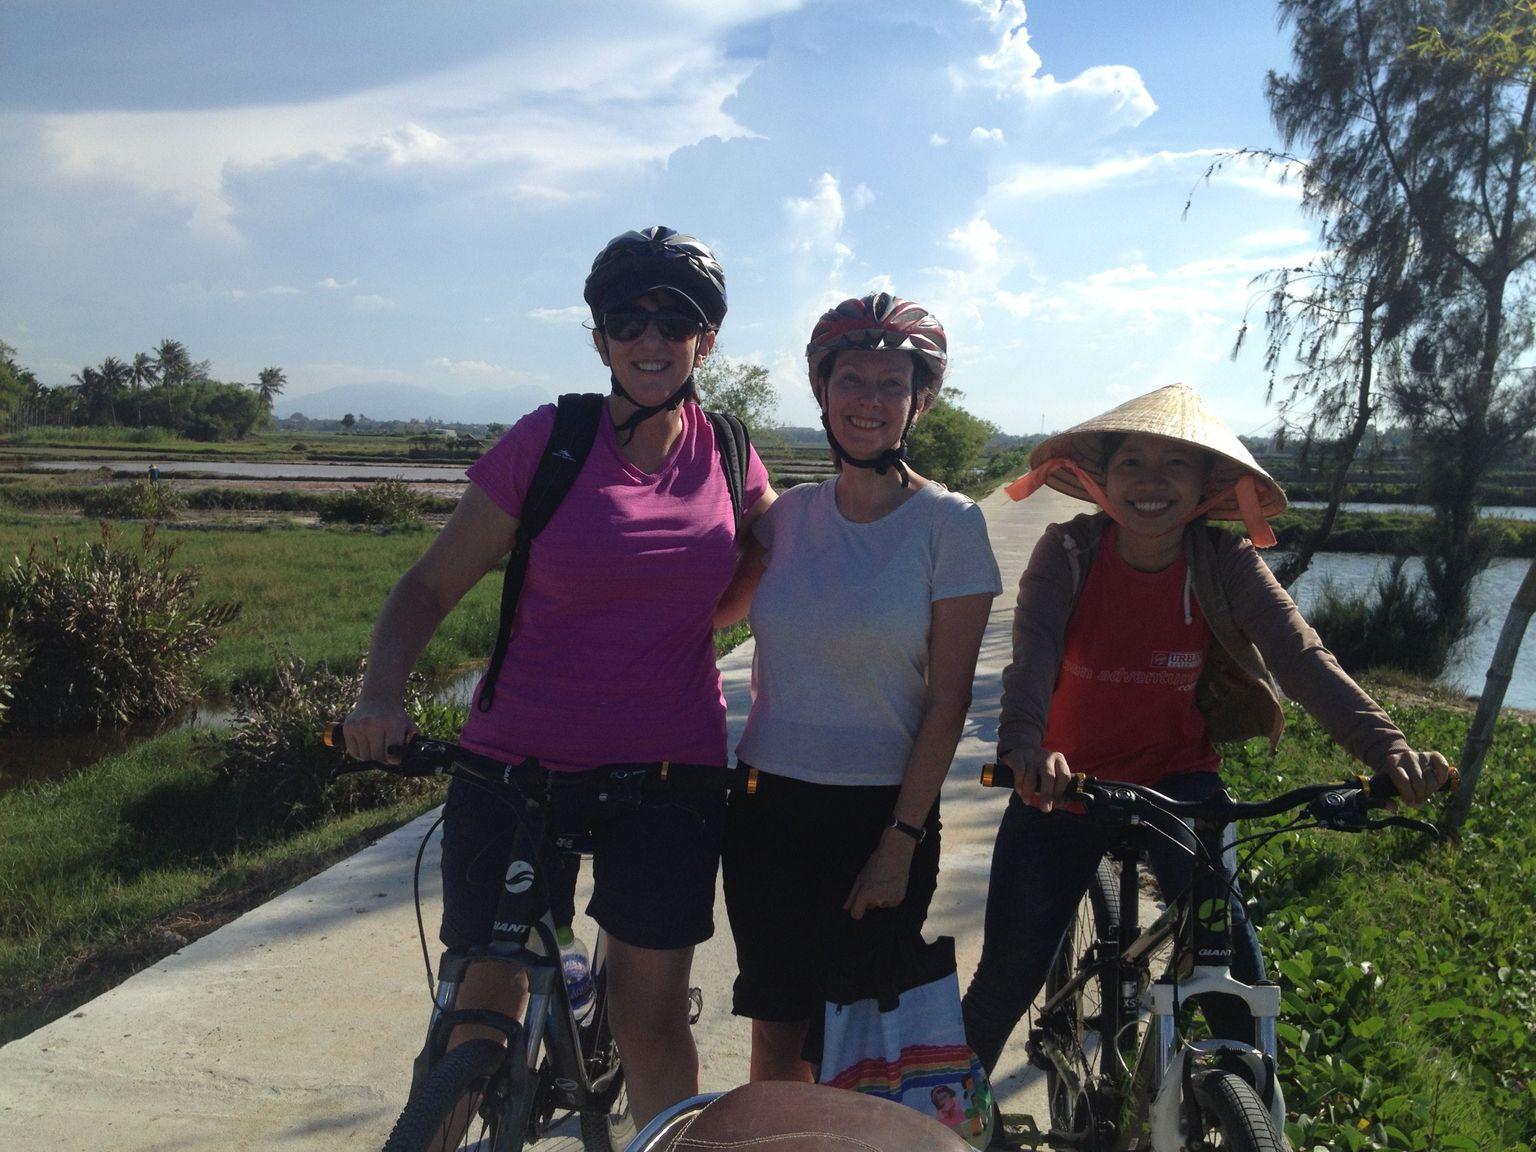 MÁS FOTOS, Hoi An Countryside Bike Tour Including Thu Bon River Cruise